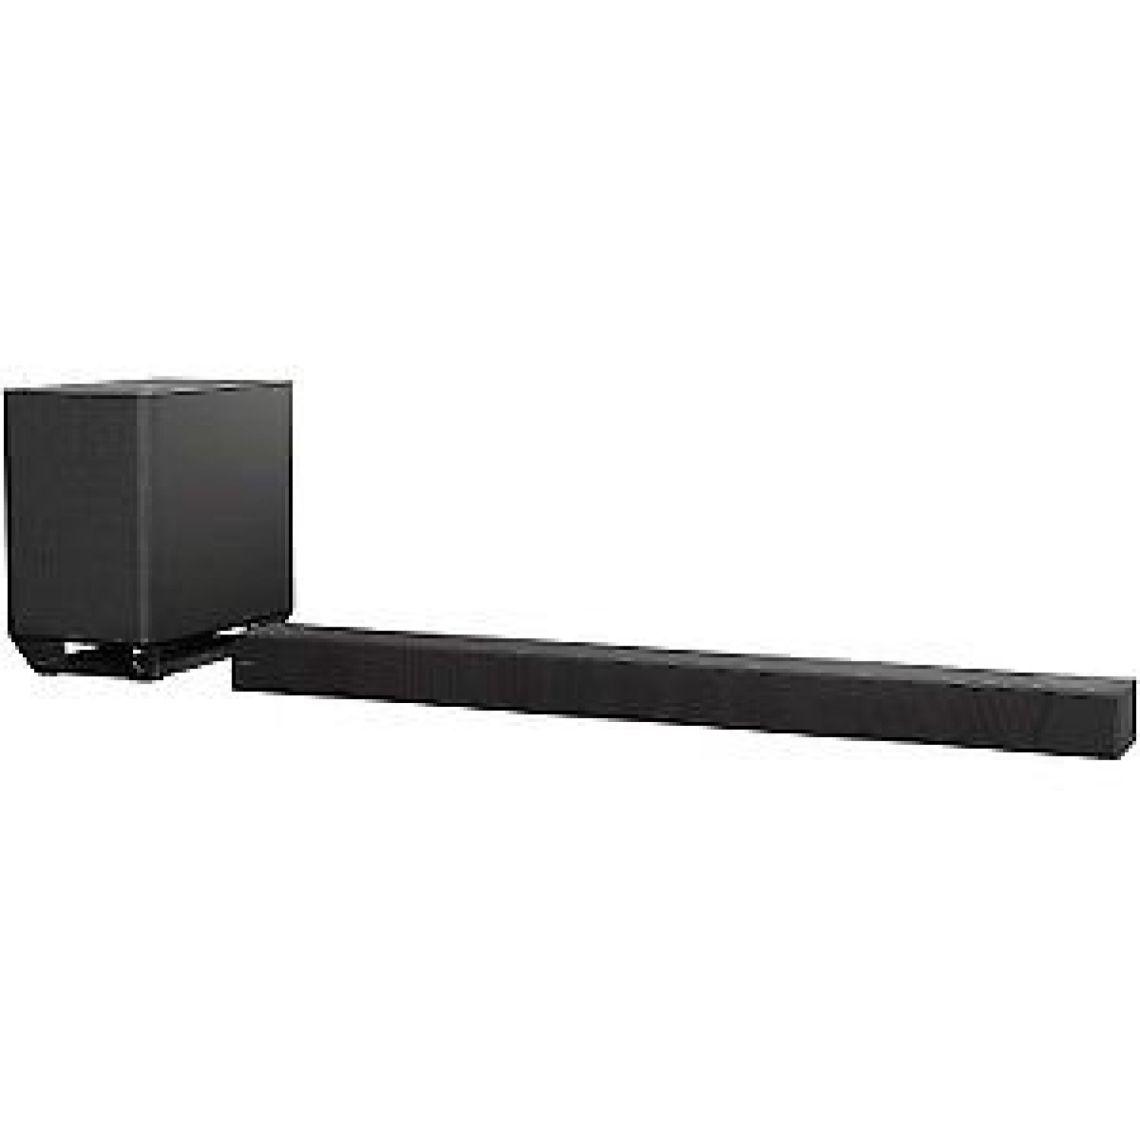 Sony HT-ST5000 7.1.2-Channel 800W Wireless Bluetooth Sound Bar Speaker 27242901605 | eBay